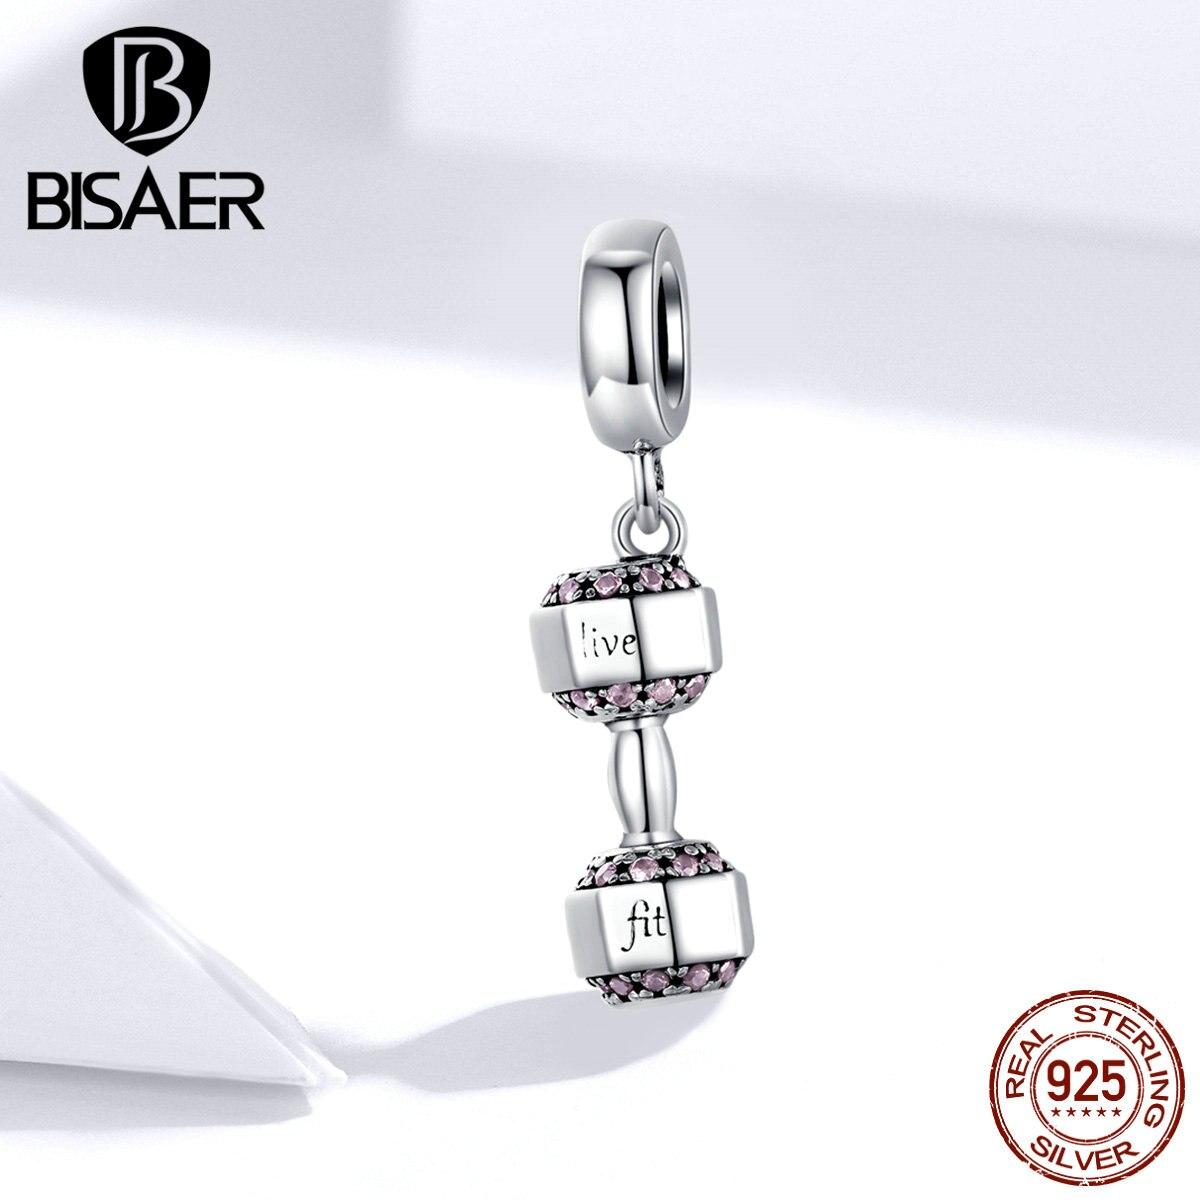 Hot Sale Dumbbell BISAER 925 Sterling Silver Dumbbell Sport Beads Fit Original Charm Bracelets Silver 925 Jewelry ECC1340